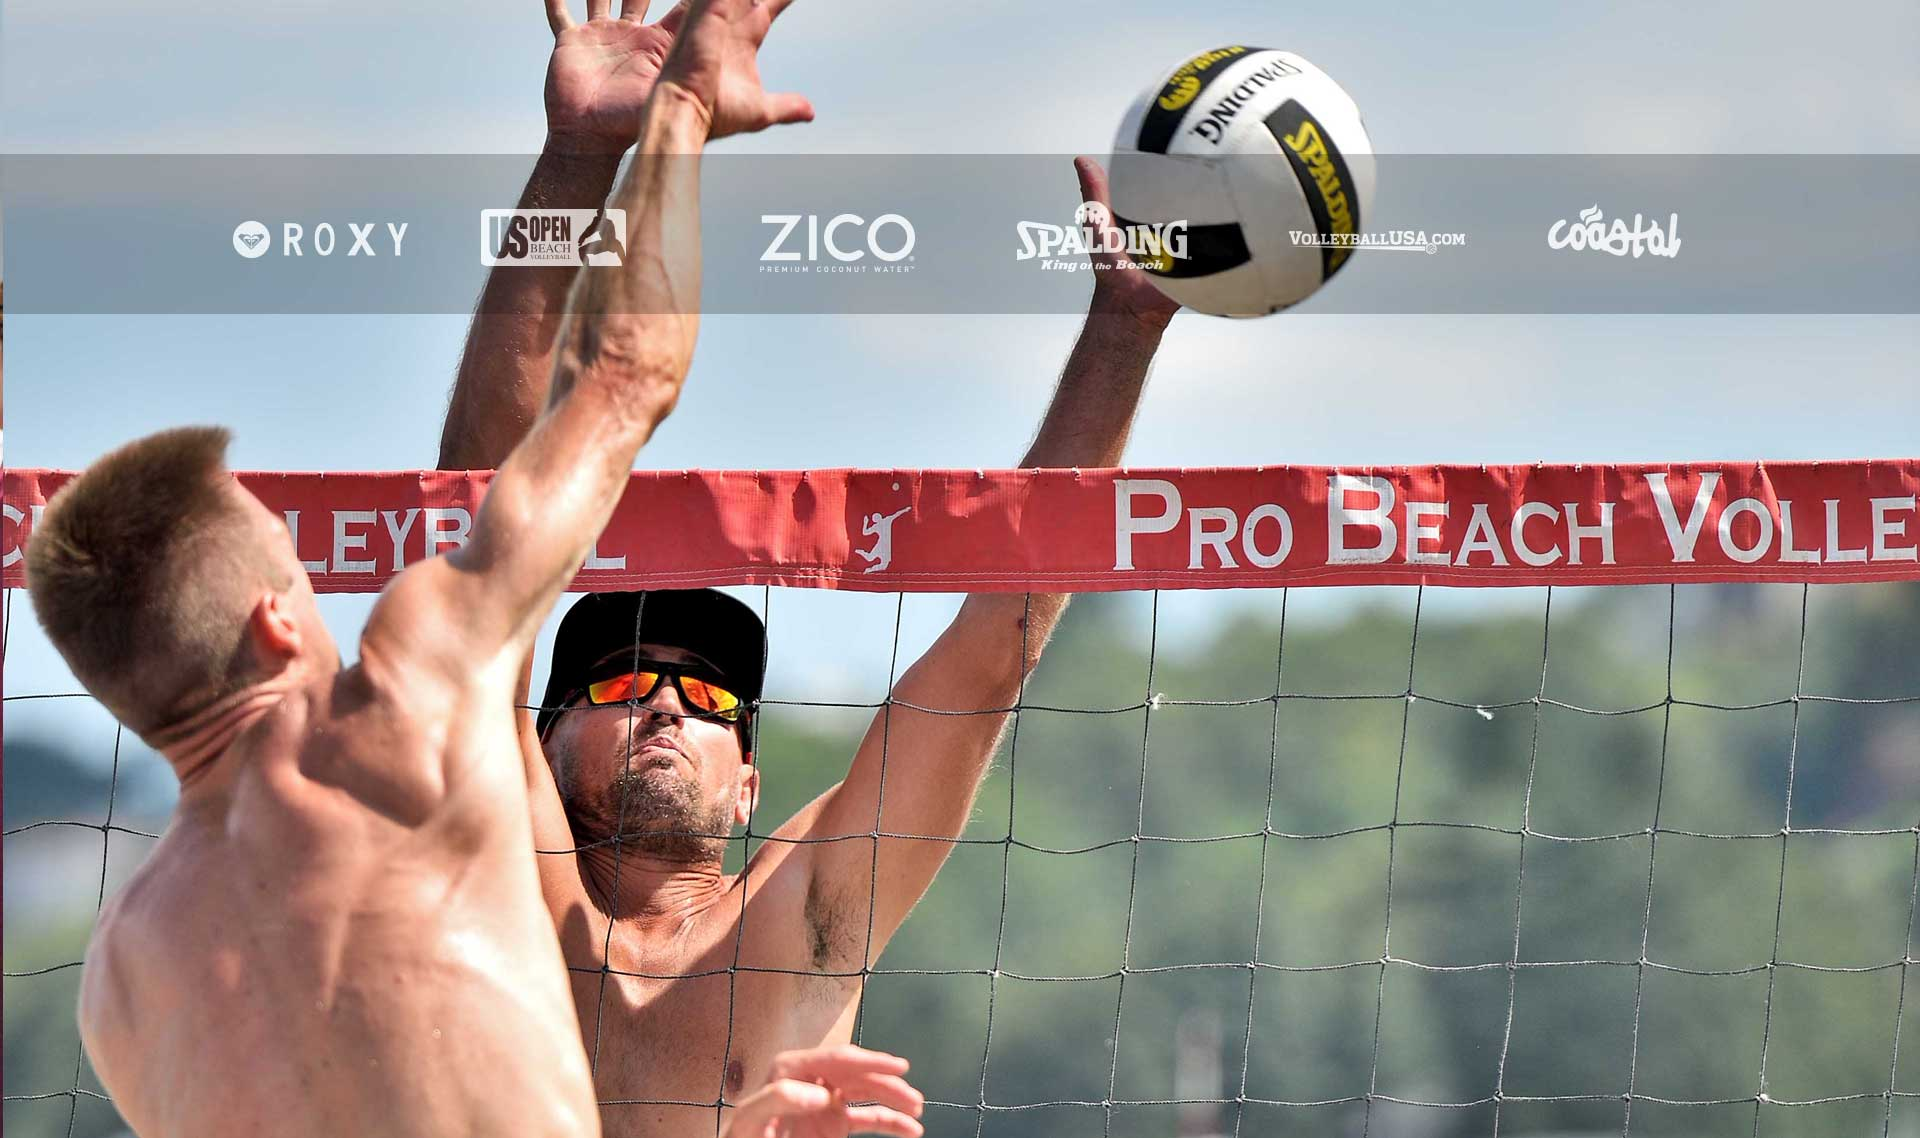 AVA 2015 Beach Season!